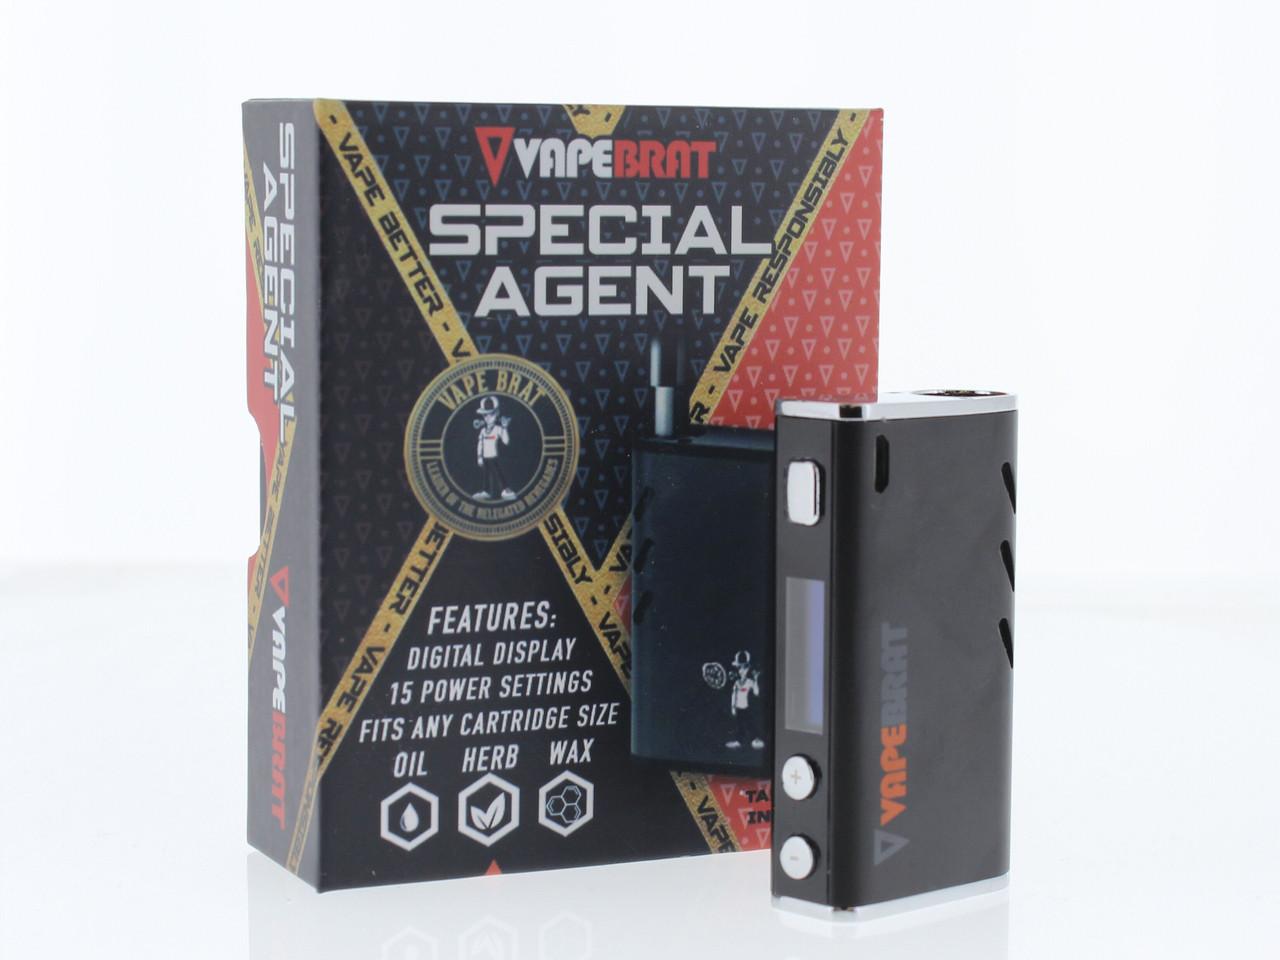 Special Agent Conceal Wax Cbd Vape Juice Pen Kit